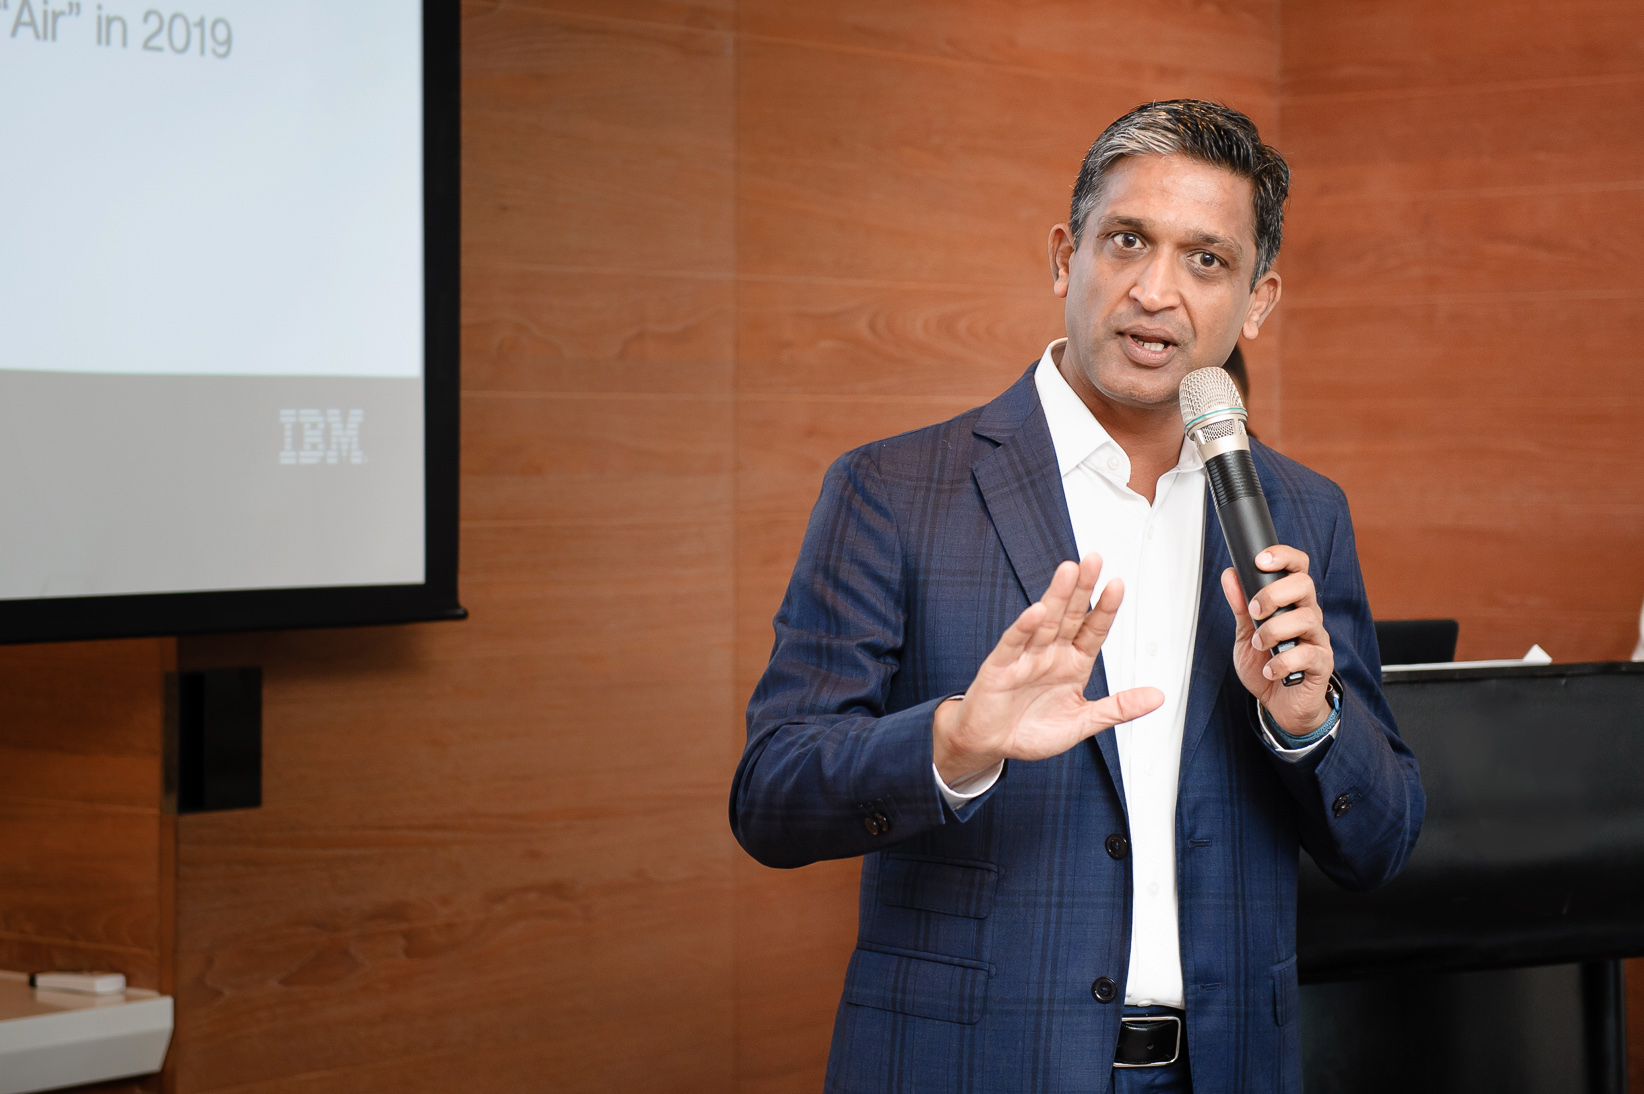 IBM 副總裁暨全球企�諮詢服務事�群DBS首�客戶合夥人Chandra Somani 分享星展銀行攜手IBM佈局「將數位化落實到核心」的轉型�略